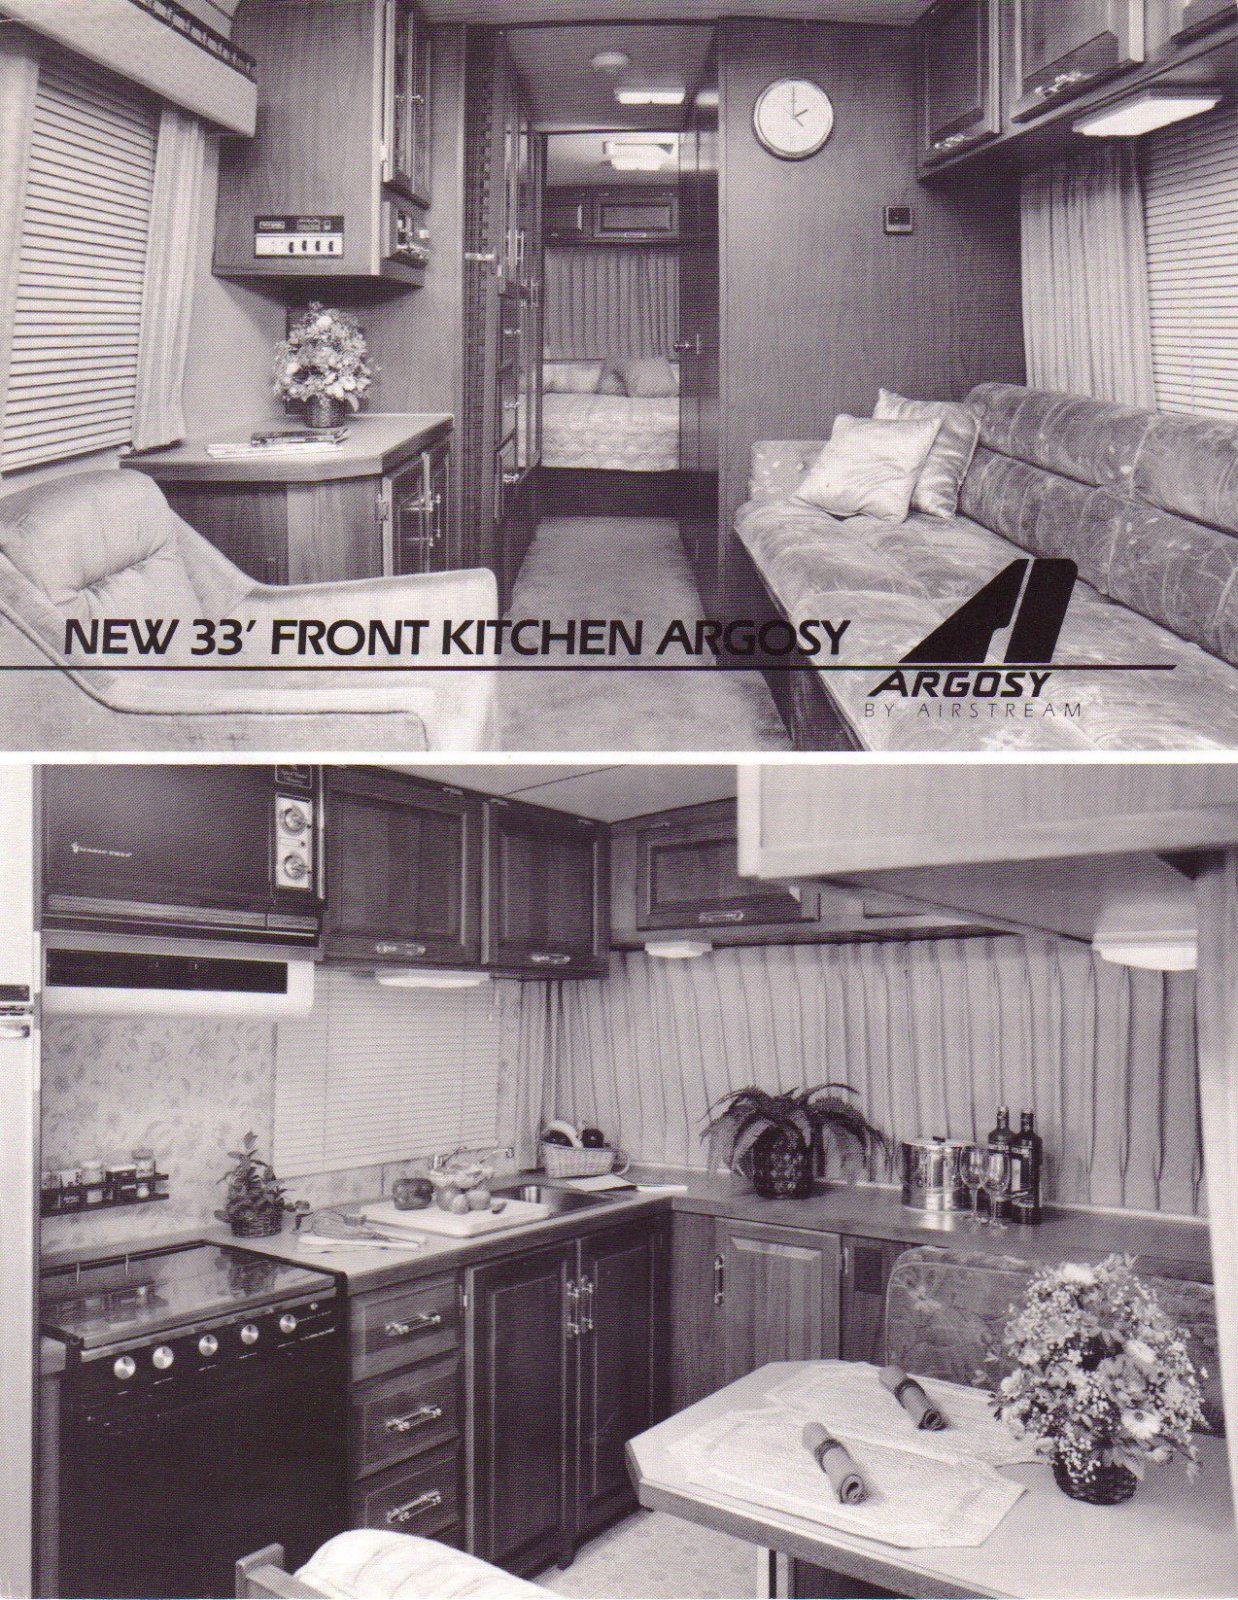 Click image for larger version  Name:1986 33ft frt kitchen Argosy.jpg Views:264 Size:574.9 KB ID:73039